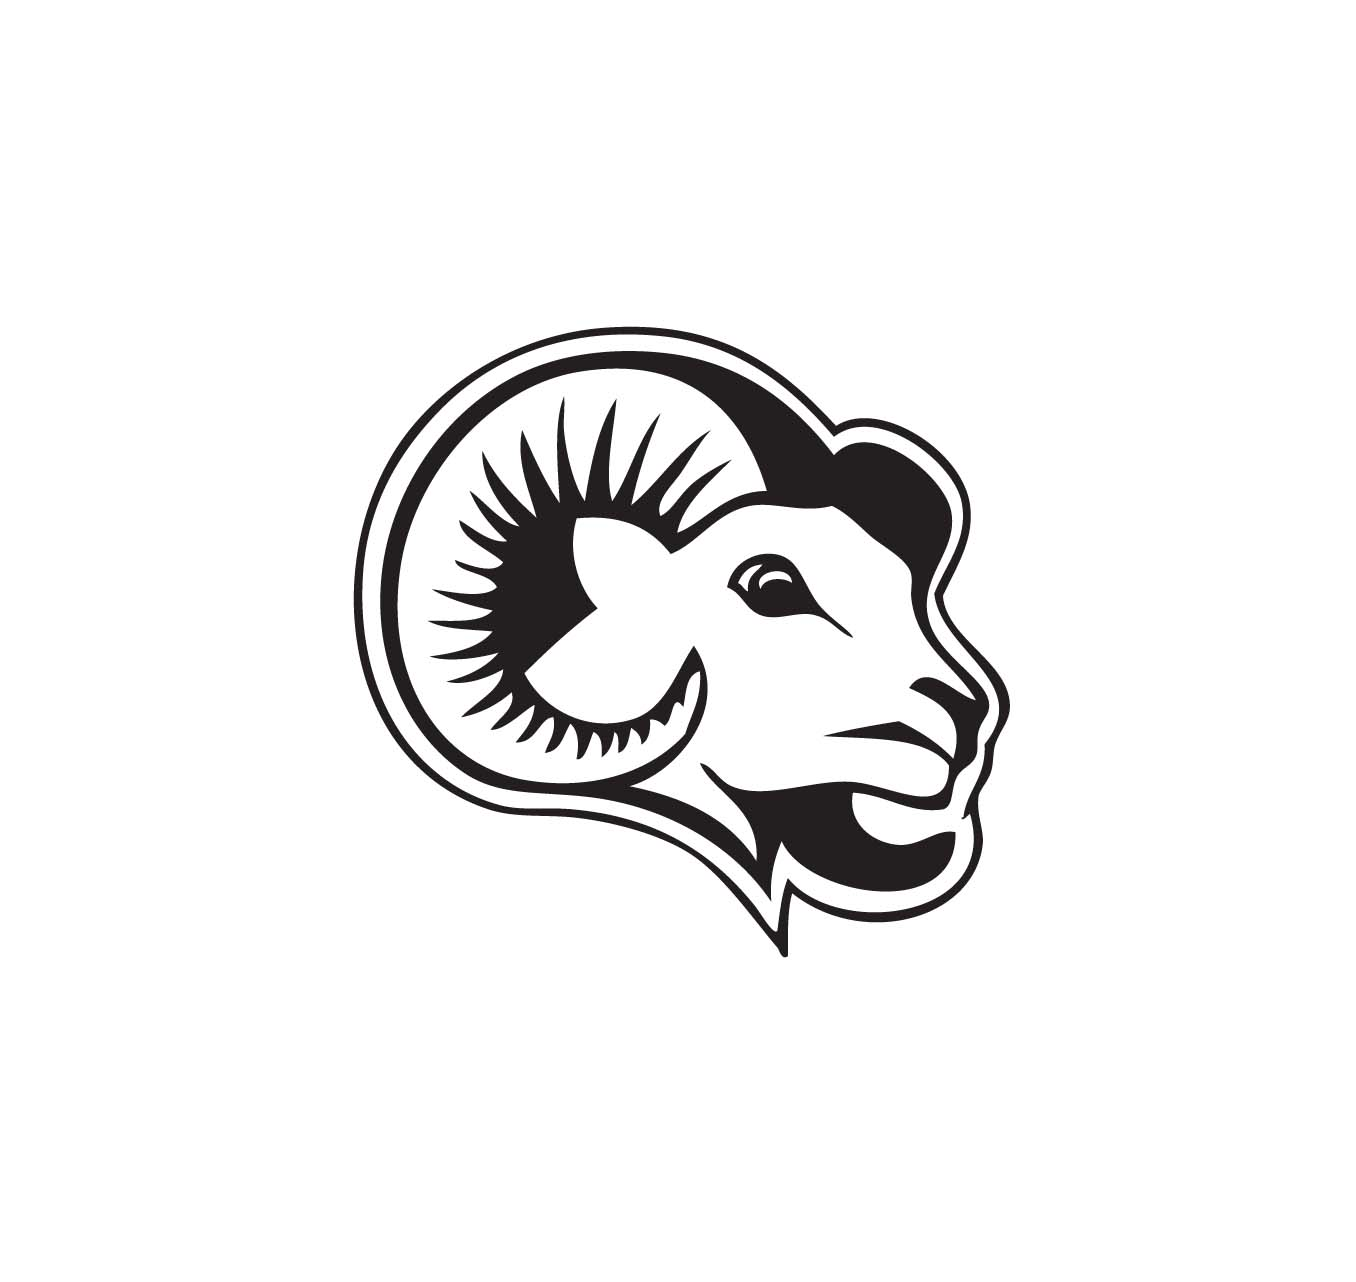 017 Ram Head Sticker 017 Ram